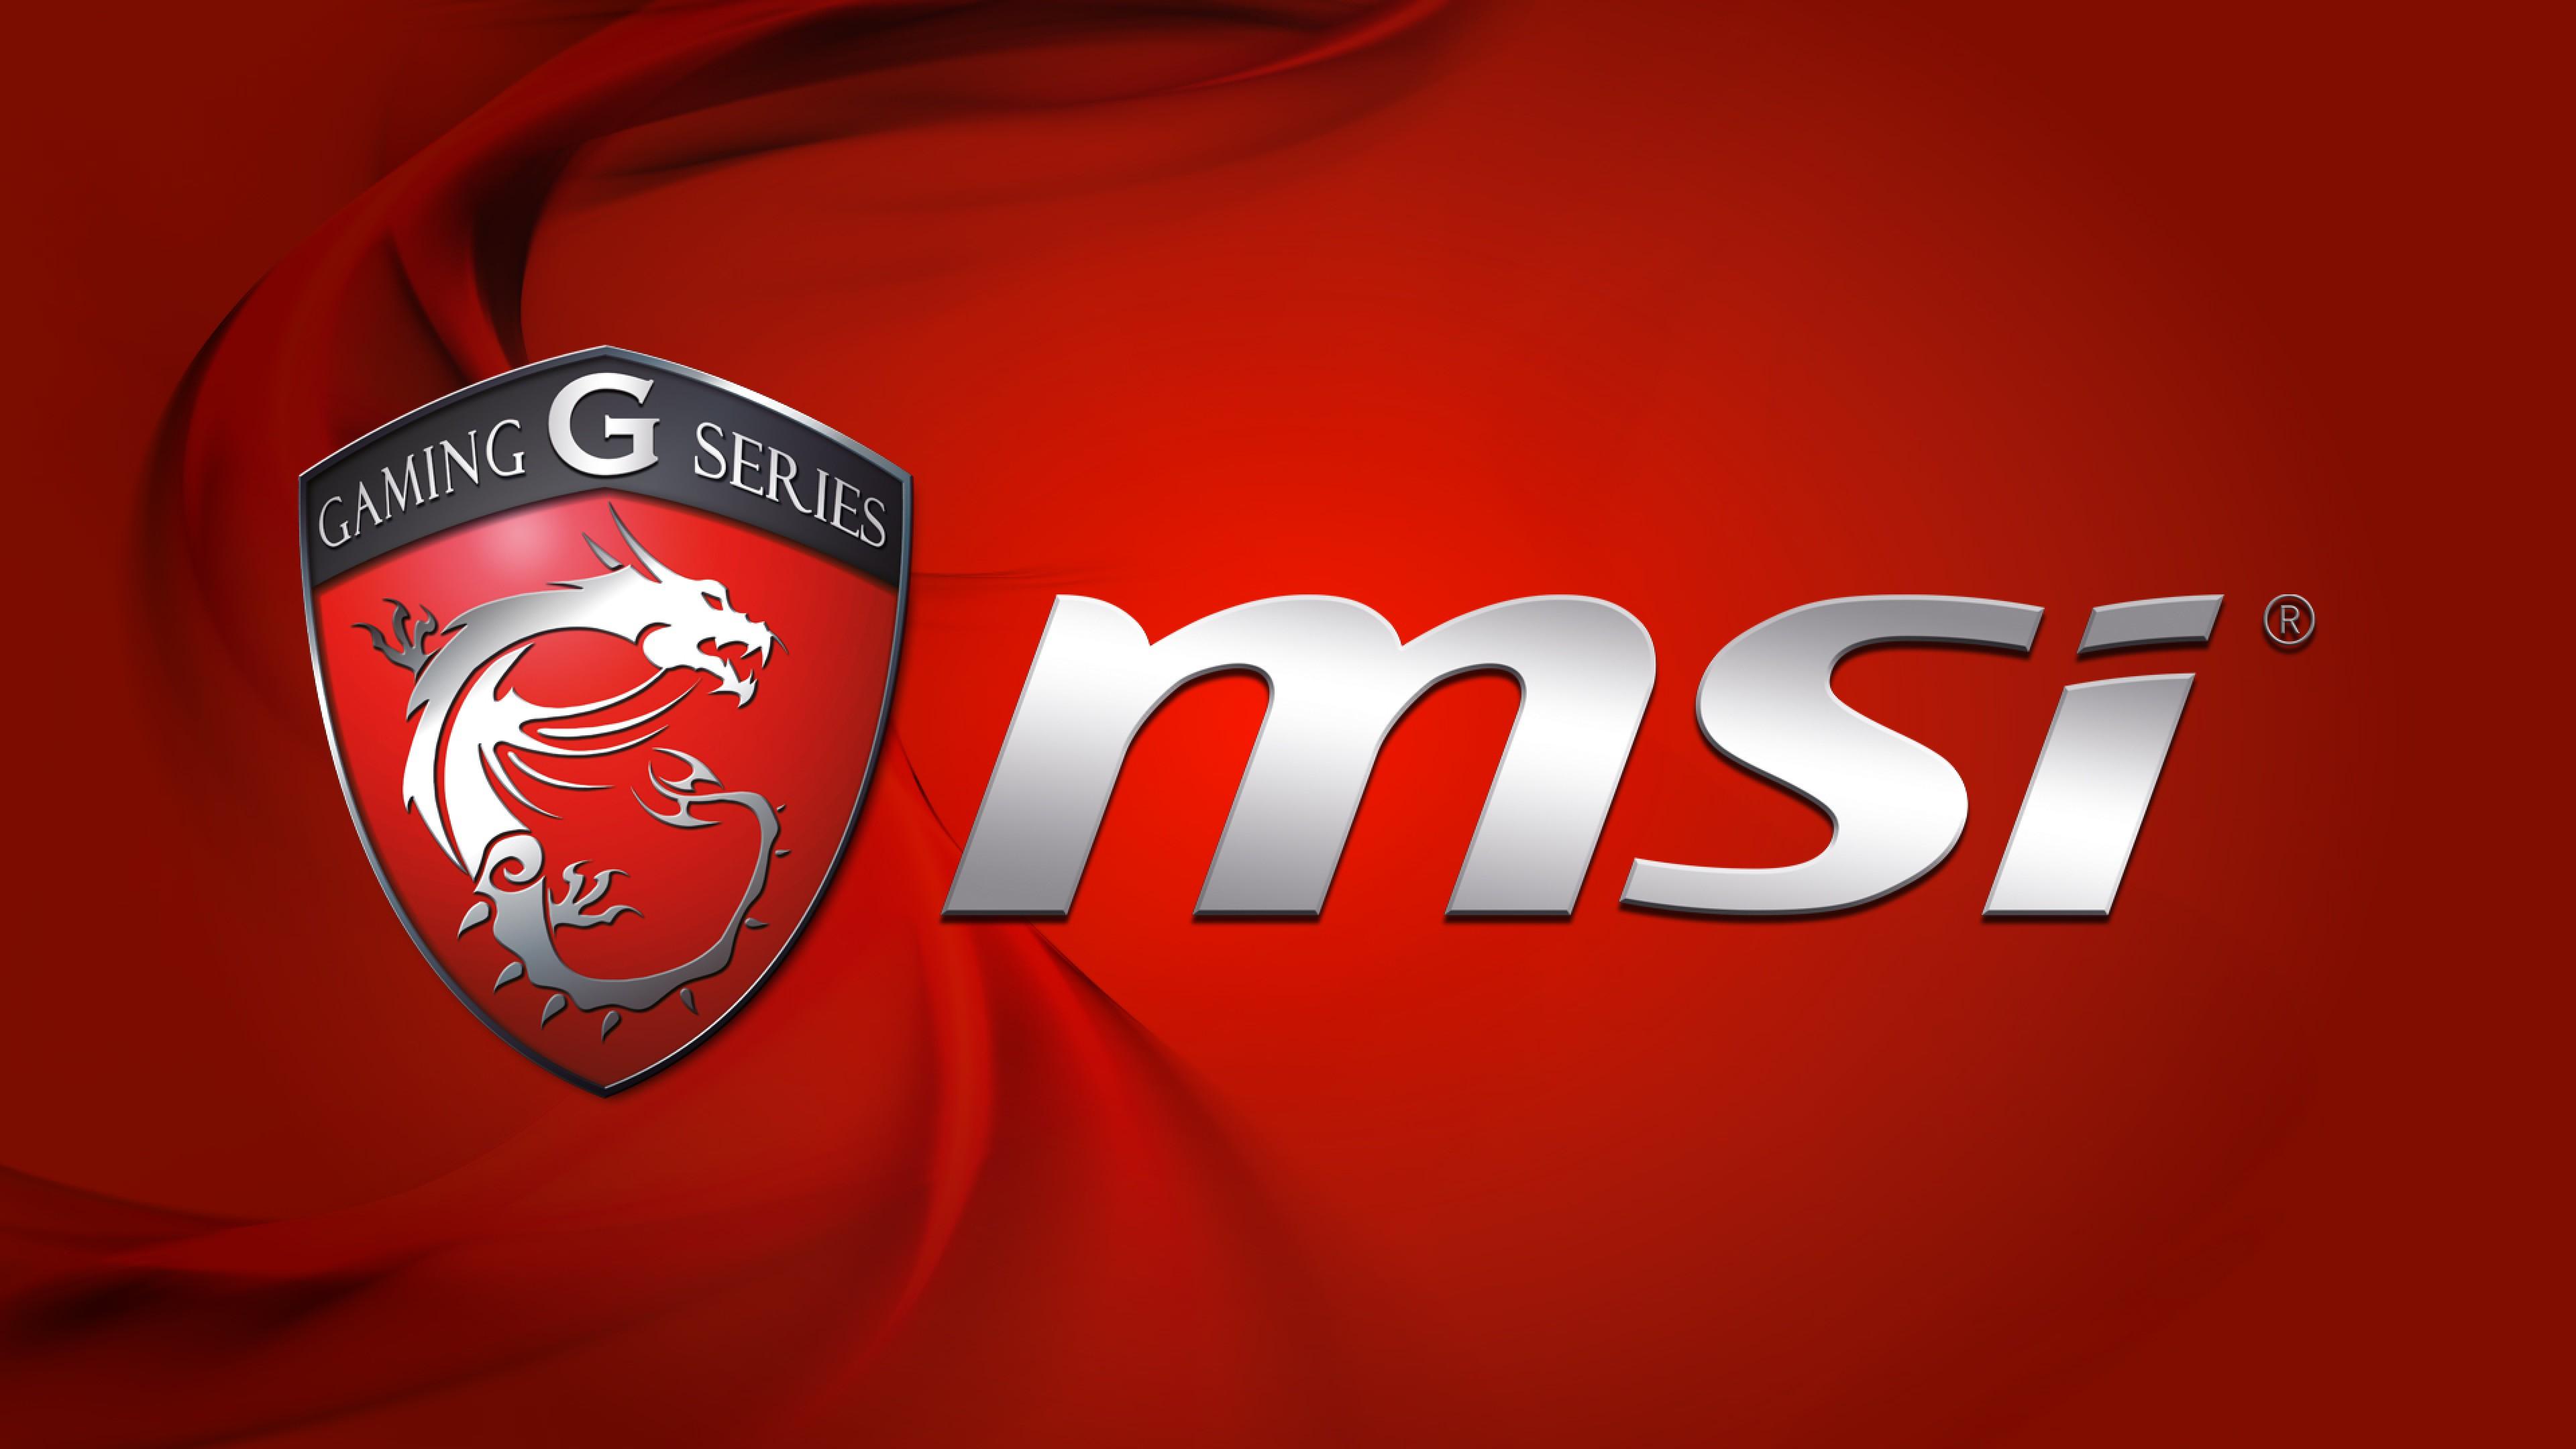 msi gaming series logo full hd wallpaper for desktop and mercedes logo mercedes logistics center vance al